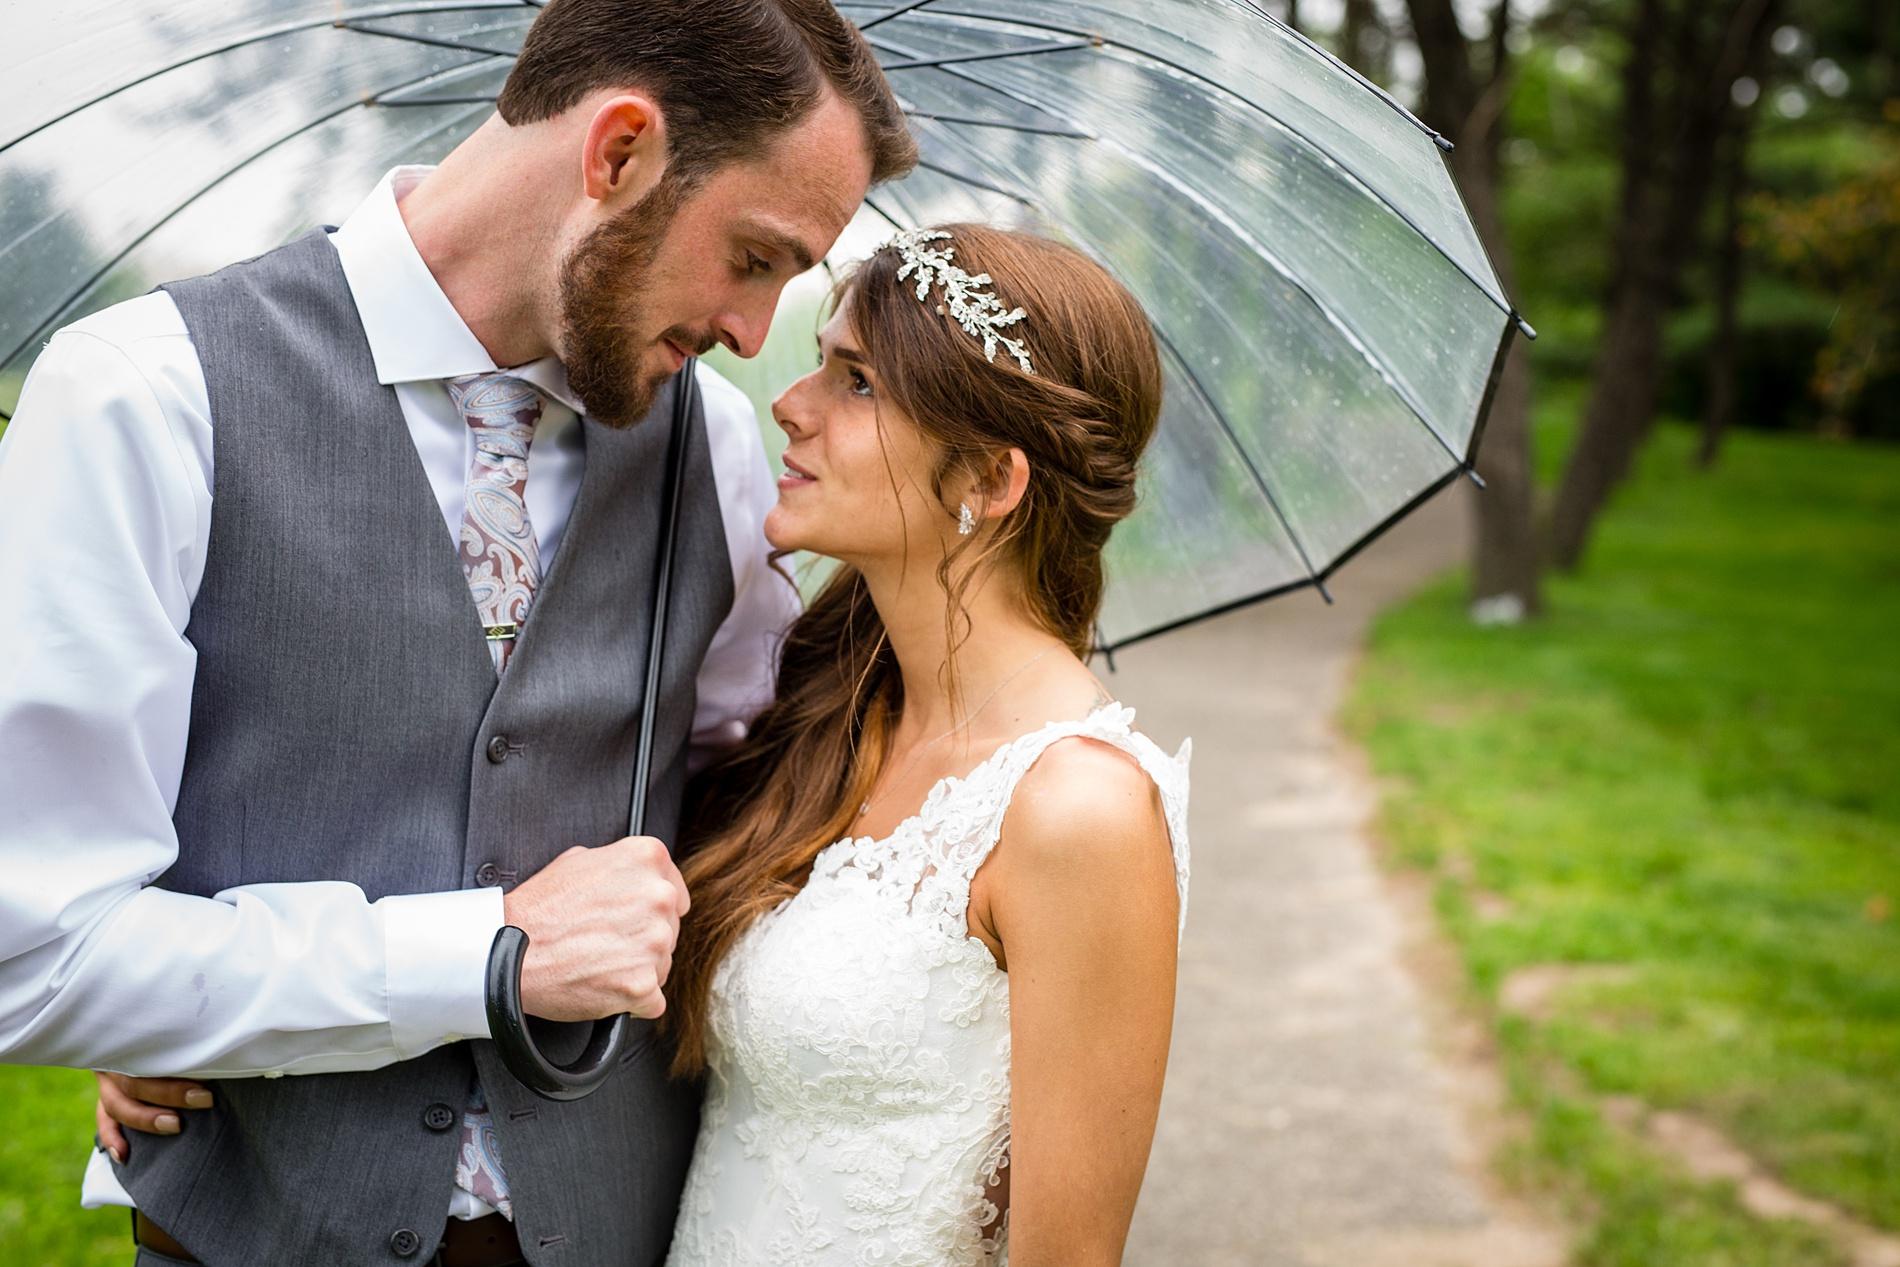 Brandon_Shafer_Photography_Brett_Autumn_Wedding_0055.jpg